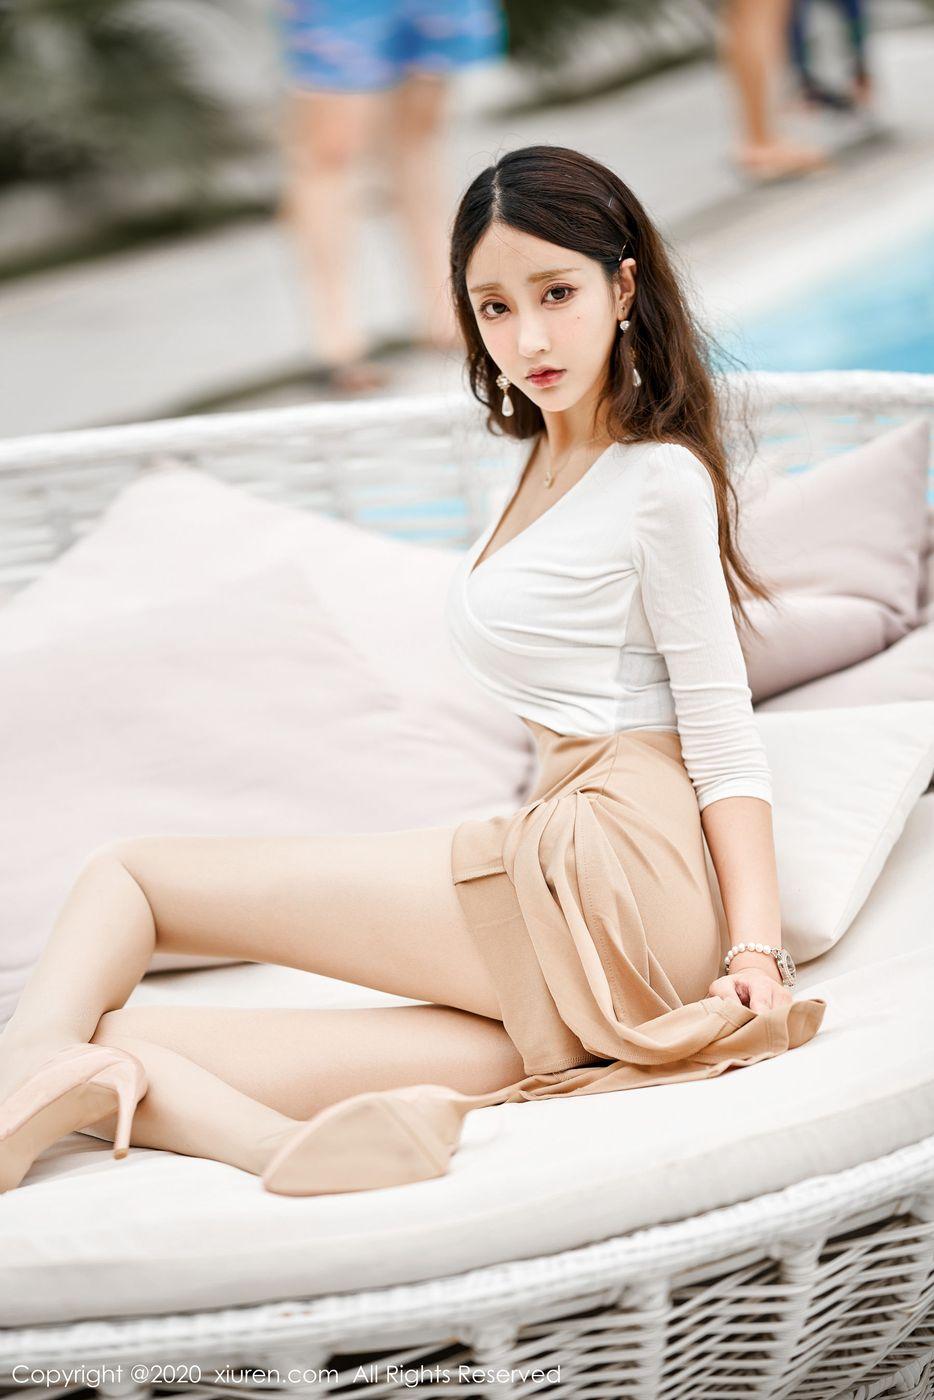 Vol.861 翘臀长裙美女丝袜美腿内衣诱惑美女模特秀人网-林子欣完整私房照合集